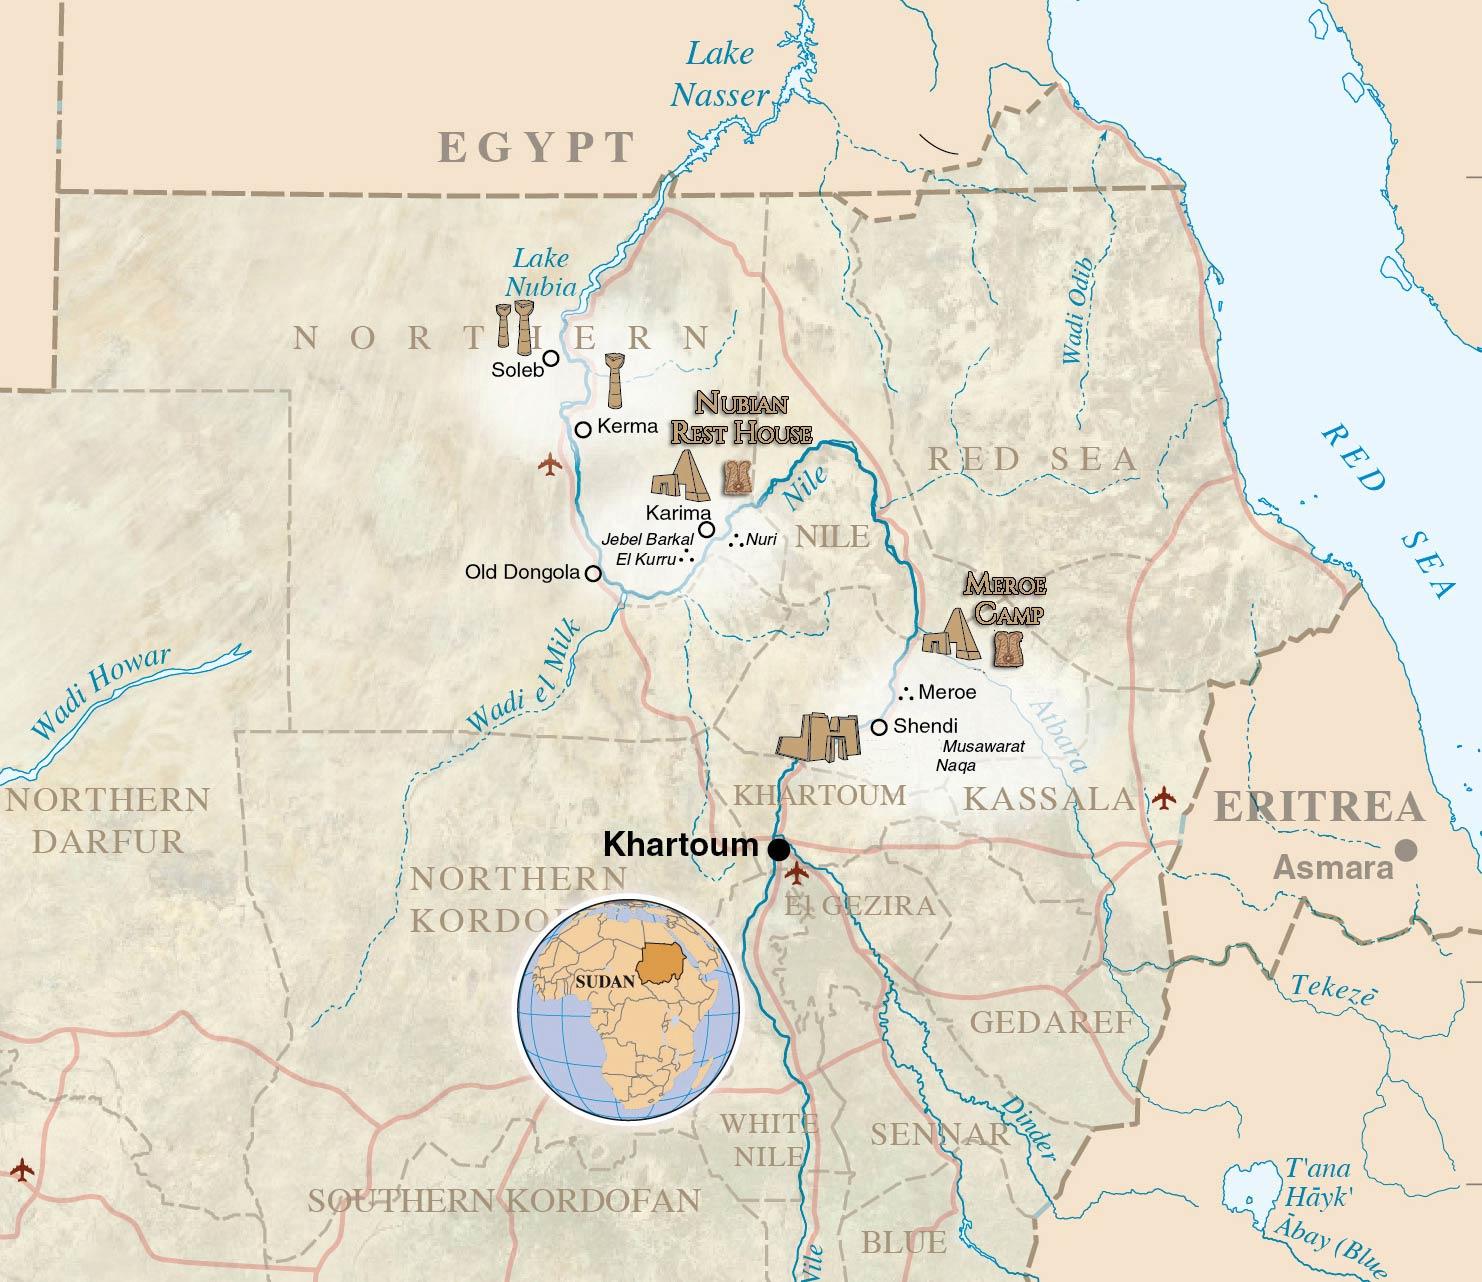 ITC Italian Tourism Sudan on atlas mountains map, egypt and sudan map, nile sudan map, damascus syria map, casablanca morocco map, accra ghana map, zambezi river africa map, south sudan region map, south sudan natural resources map, tehran map, istanbul turkey map, tripoli libya map, tel aviv map, dongola sudan map, nairobi map, riyadh map, nile river map, s. sudan map, mogadishu somalia map,